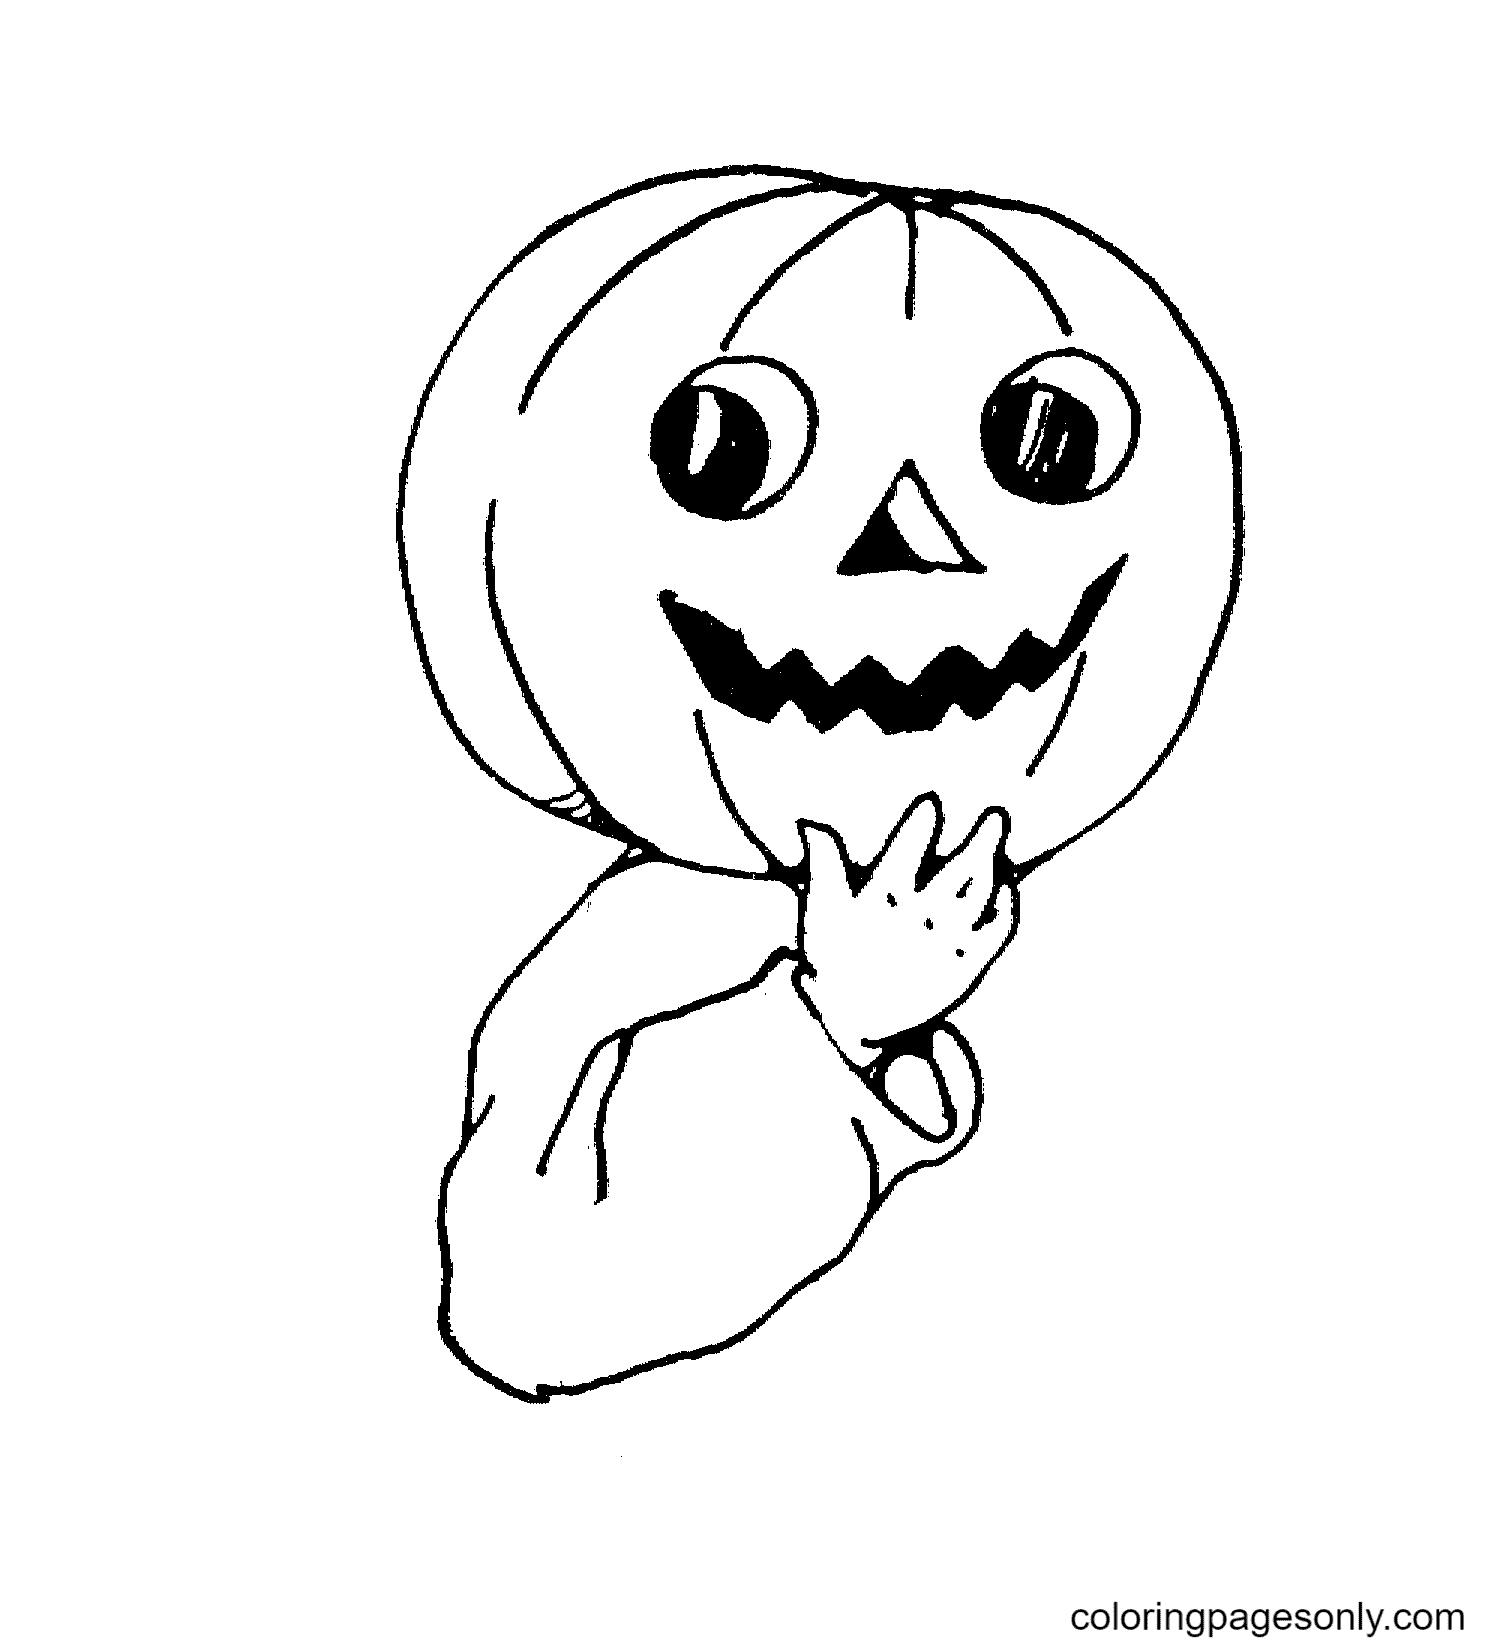 Halloween pumpkin on boy's head Coloring Page